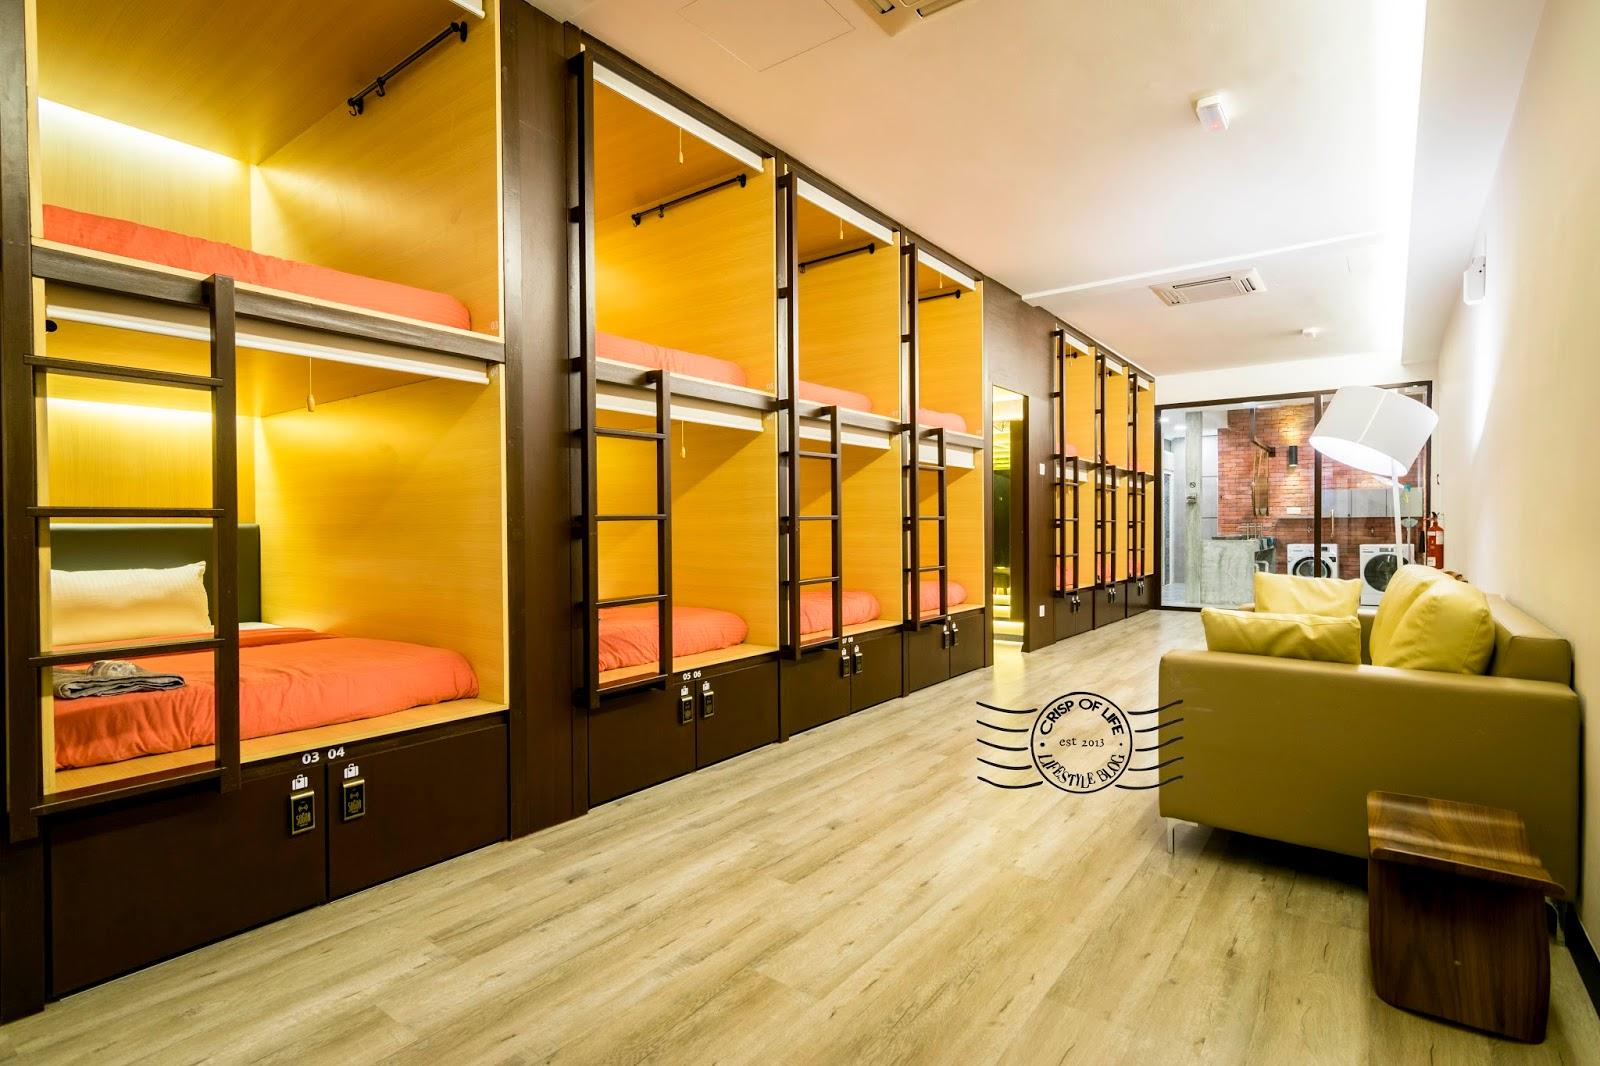 Penang First Women Only Capsule Hotel - Sogor Girls Dormitory @ Jalan Burmah, Penang